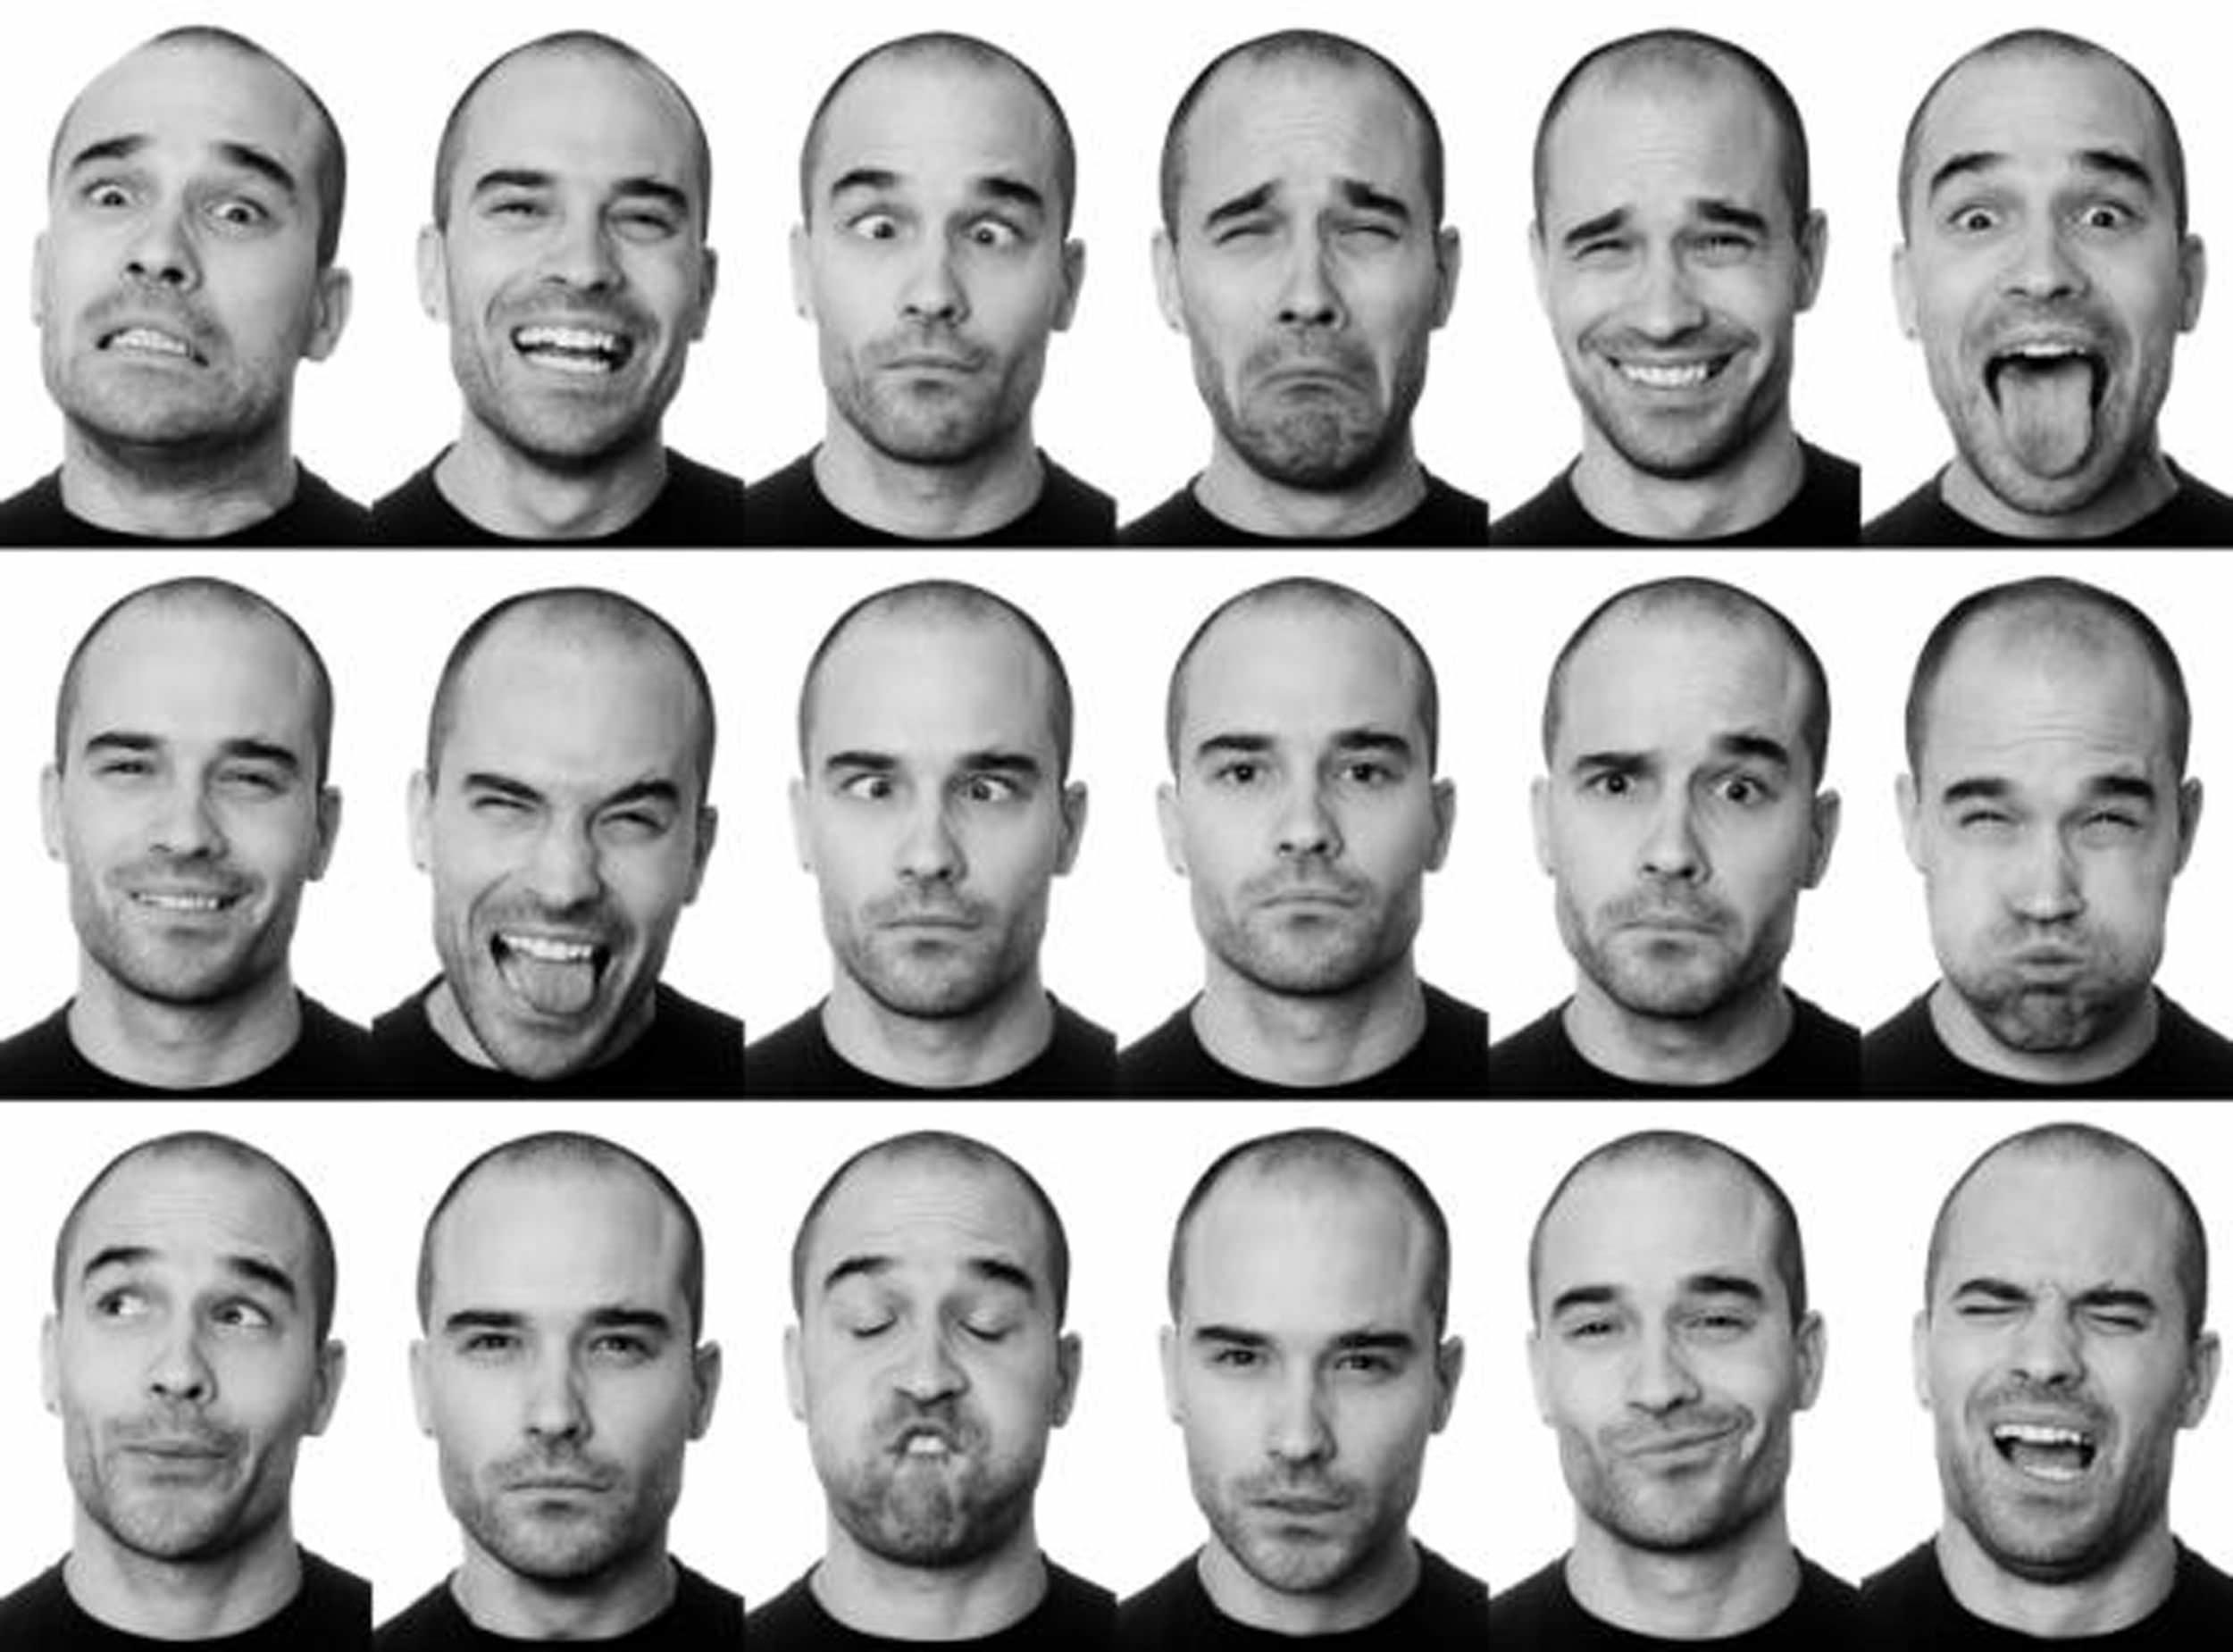 Мимика и эмоции у мужчины